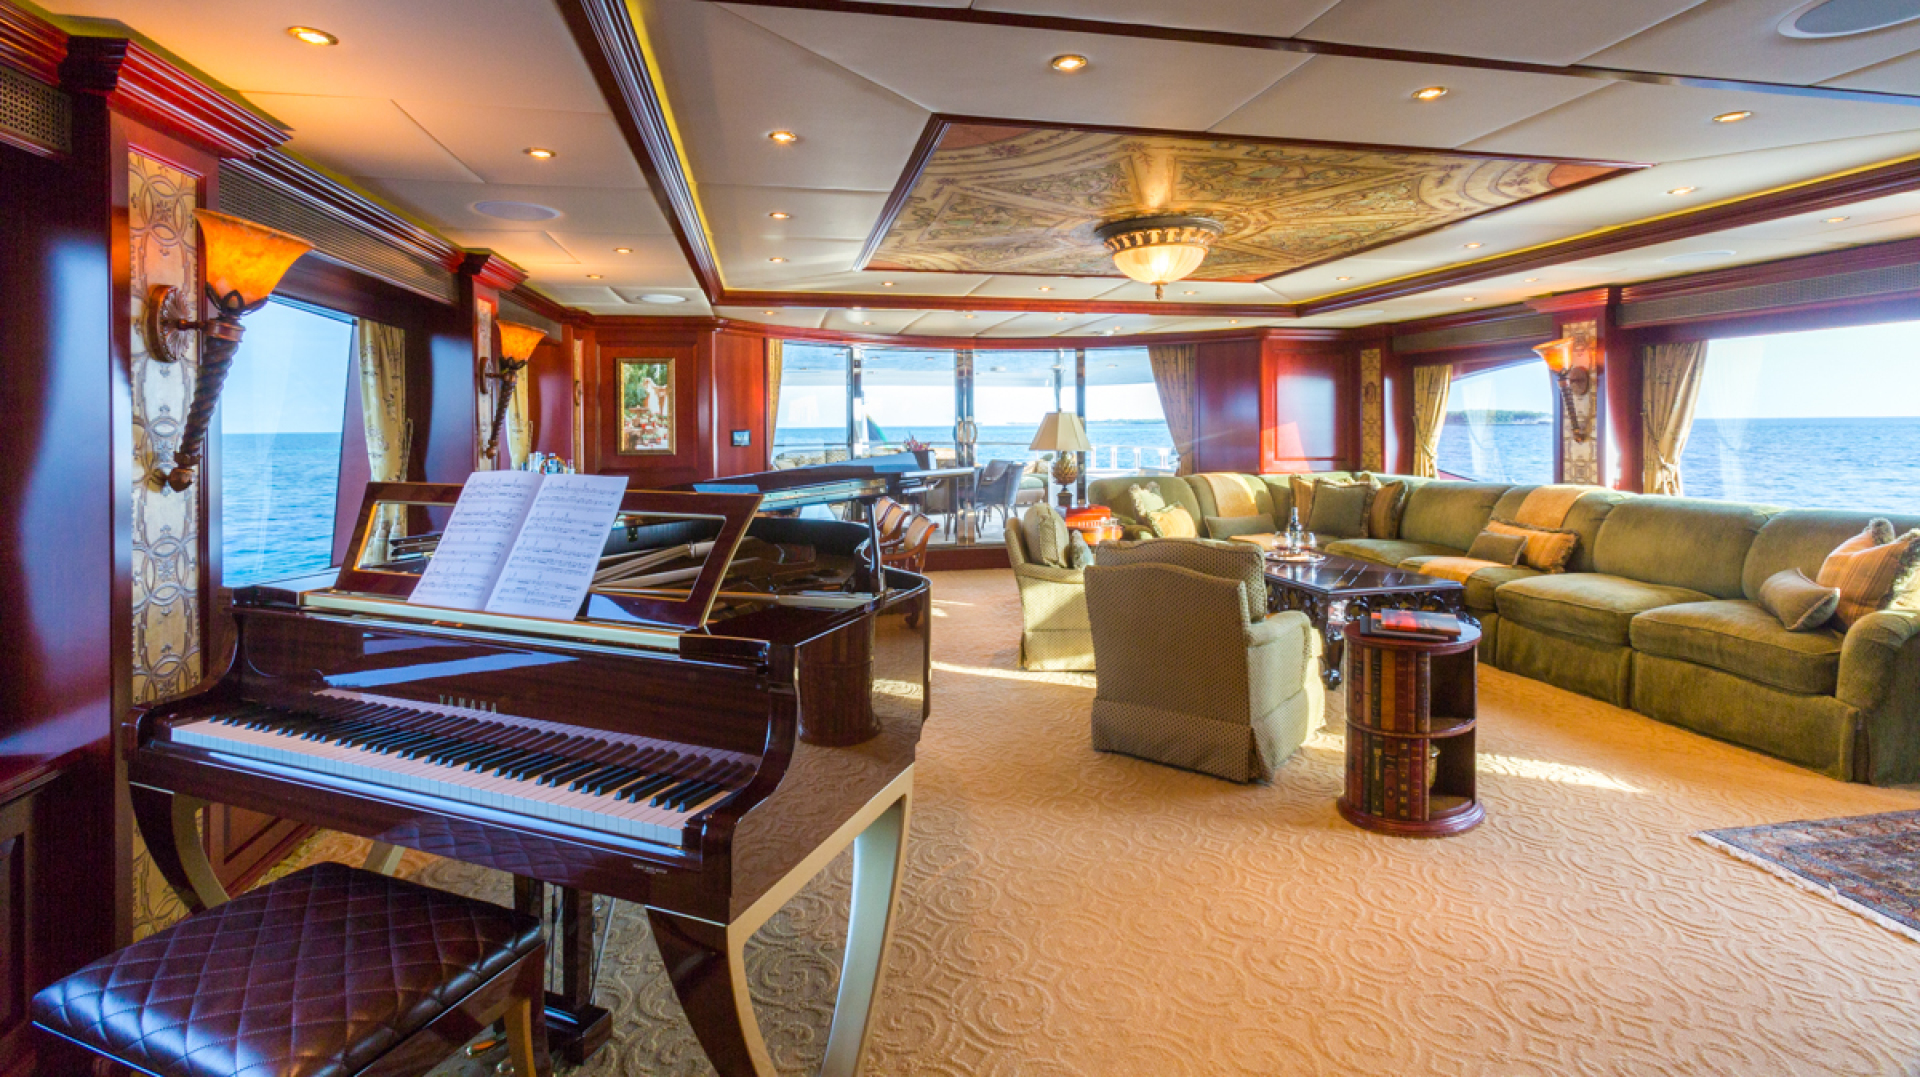 Trinity Yachts-164 Tri-deck Motor Yacht 2008-Amarula Sun Fort Lauderdale-Florida-United States-Skylounge Salon and Baby Grand Piano-1513952 | Thumbnail